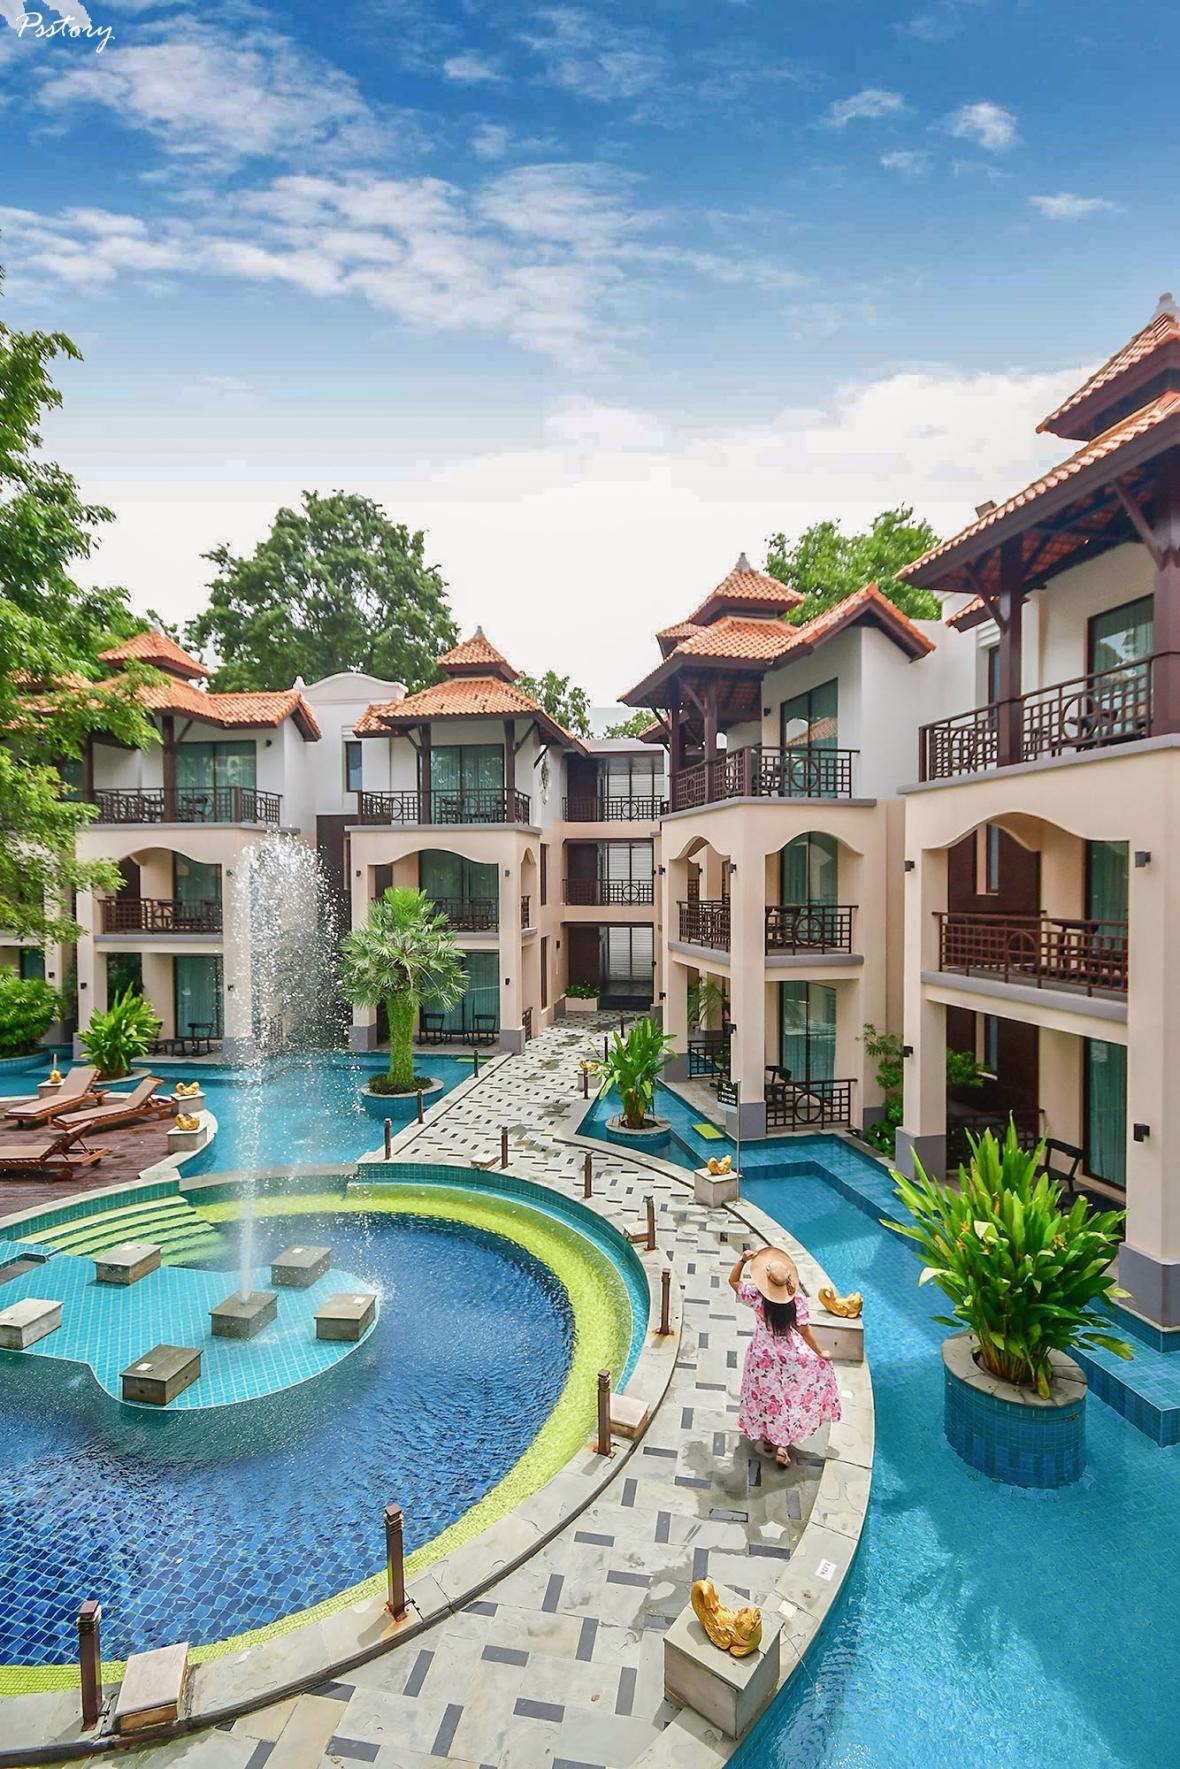 Long Beach Pattaya (81)